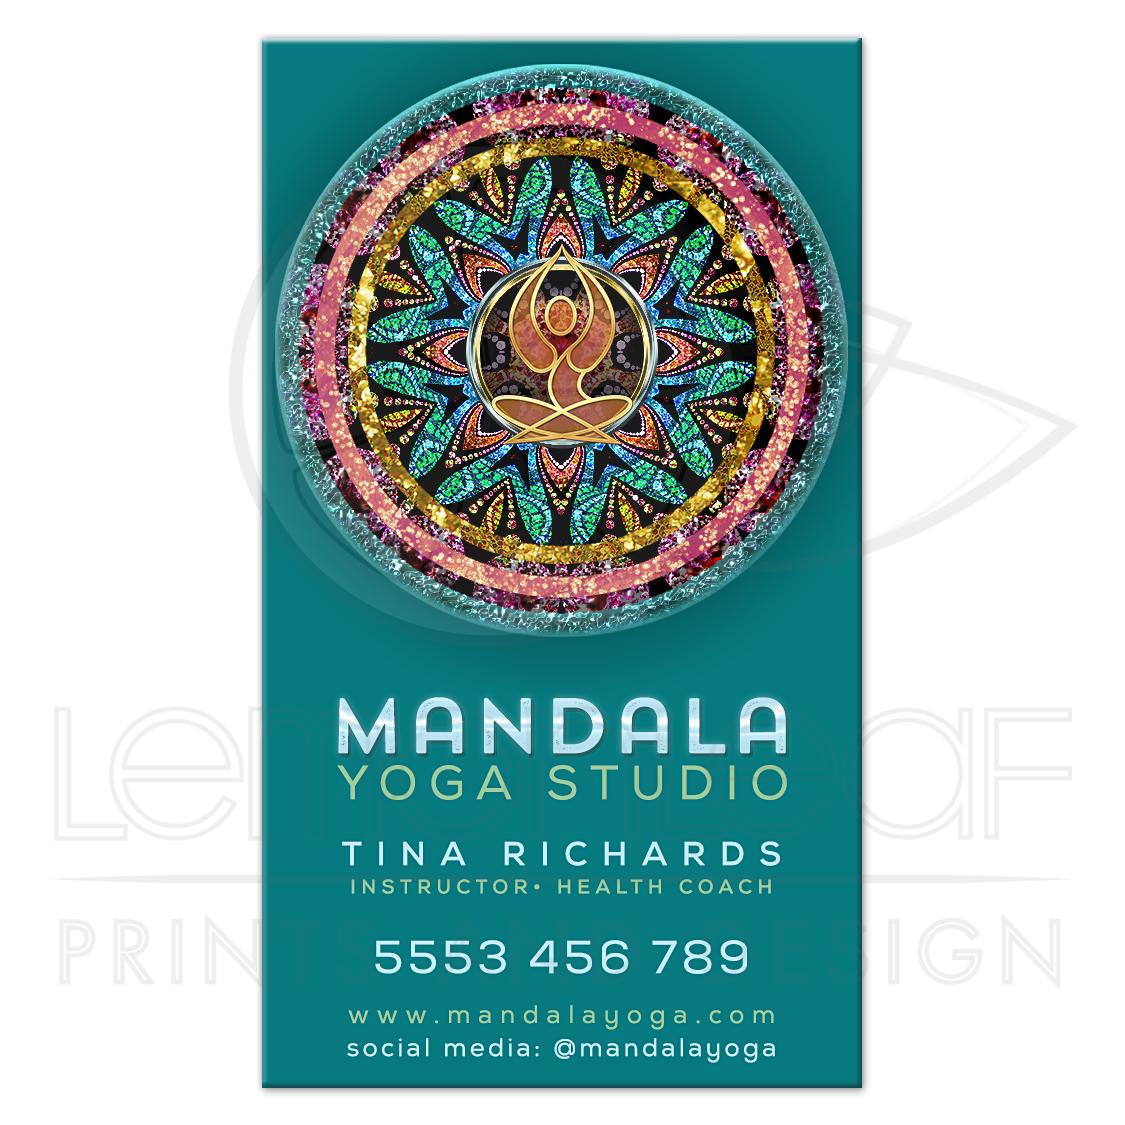 Mandala Yoga Goddess Teal Business Card